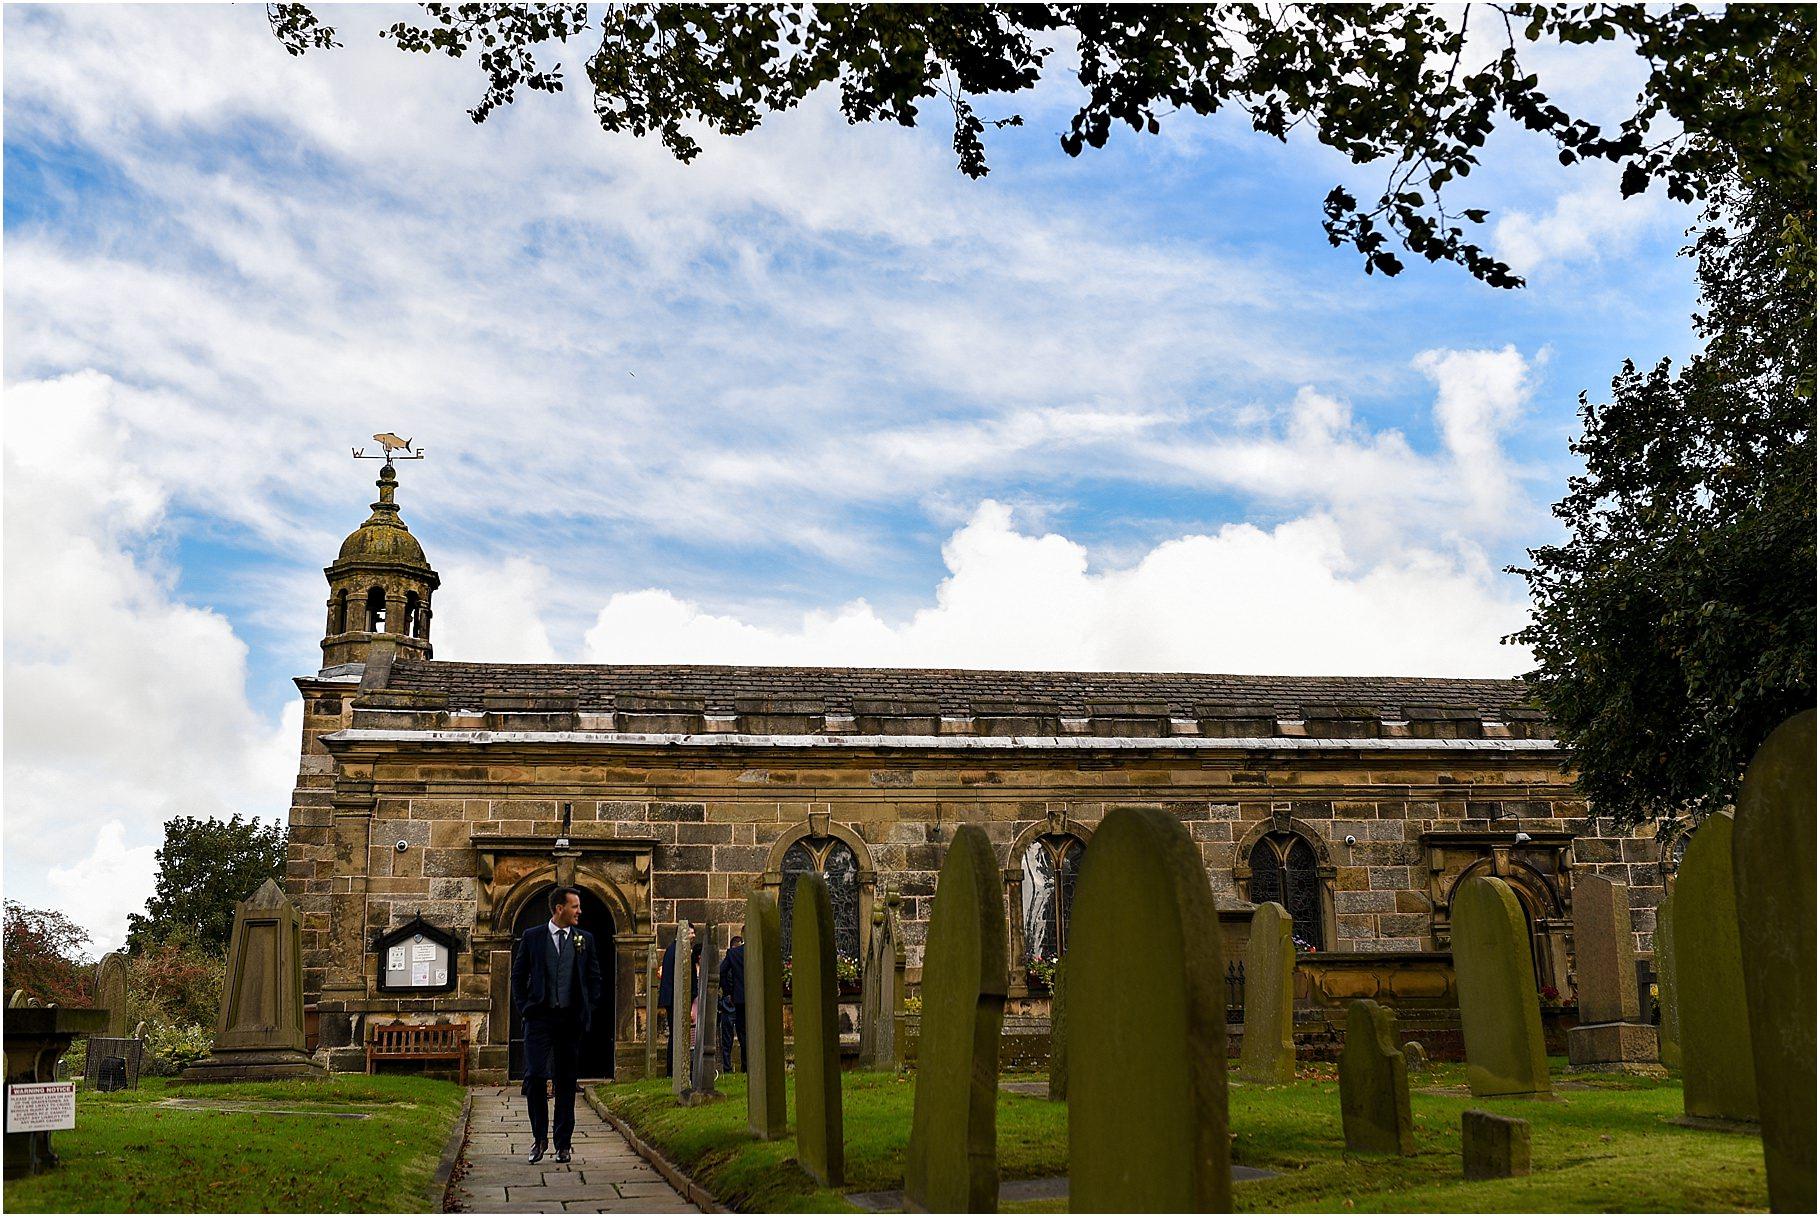 bartle-hall-wedding-photography-026.jpg